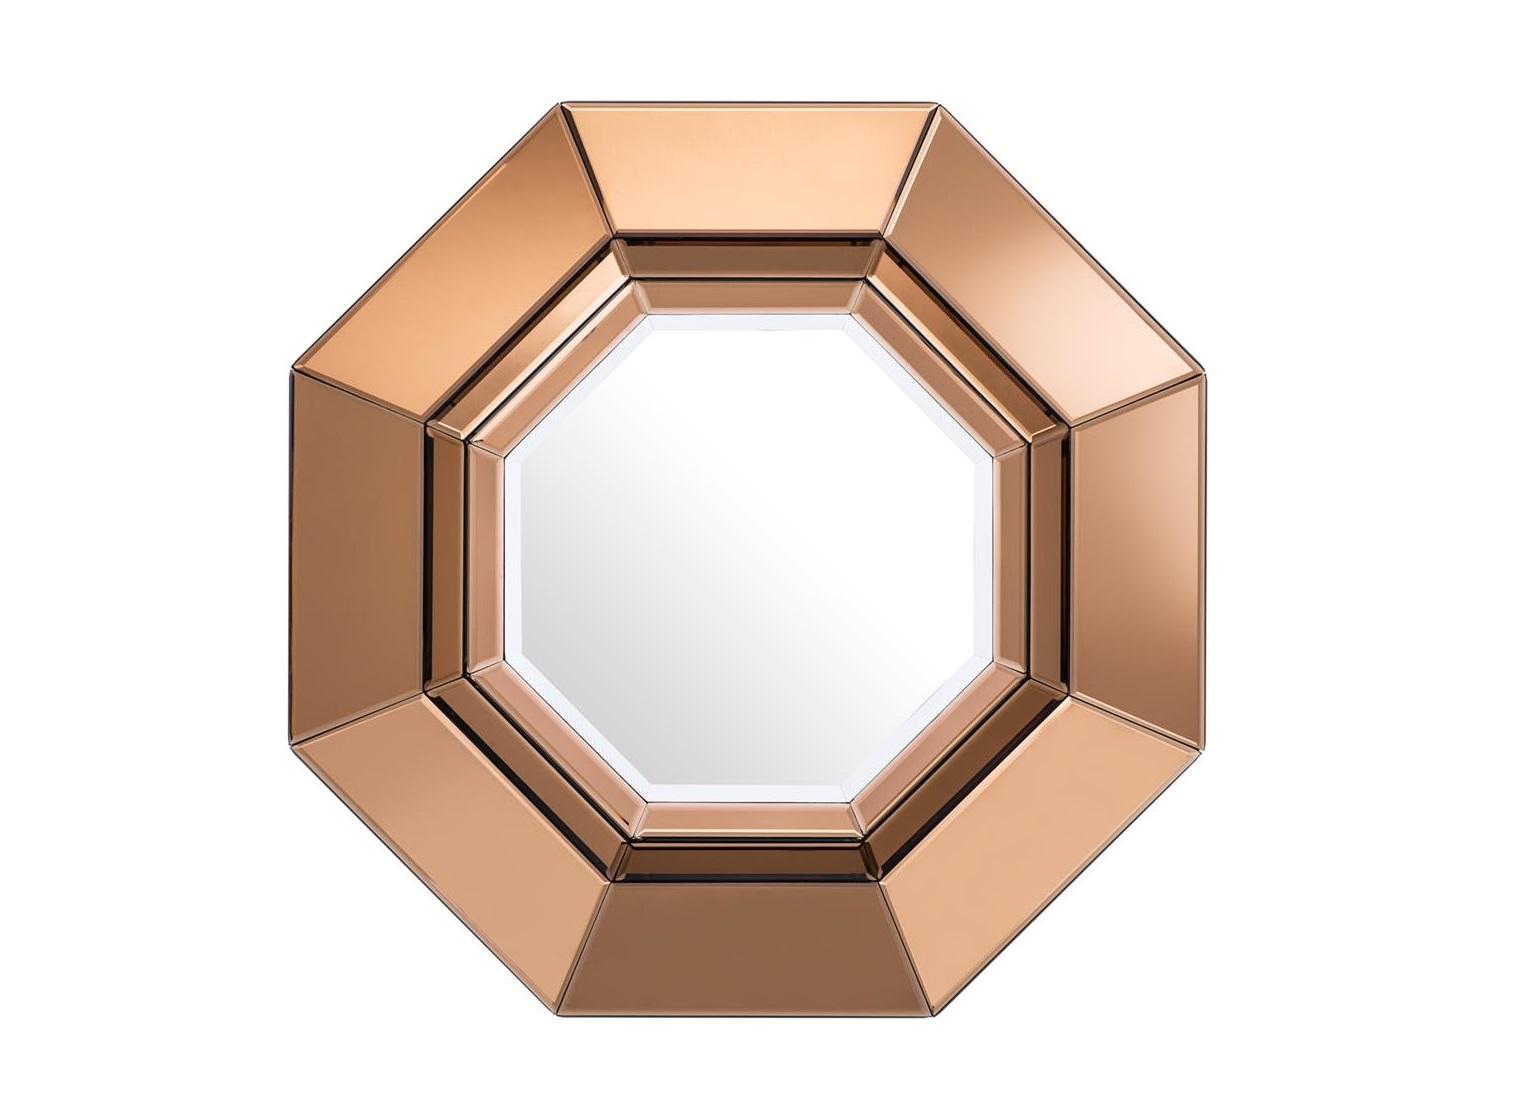 ЗеркалоНастенные зеркала<br>Зеркало Mirror Chartier в рамке из зеркального стекла янтарного цвета.<br><br>Material: Стекло<br>Height см: 68<br>Diameter см: 68